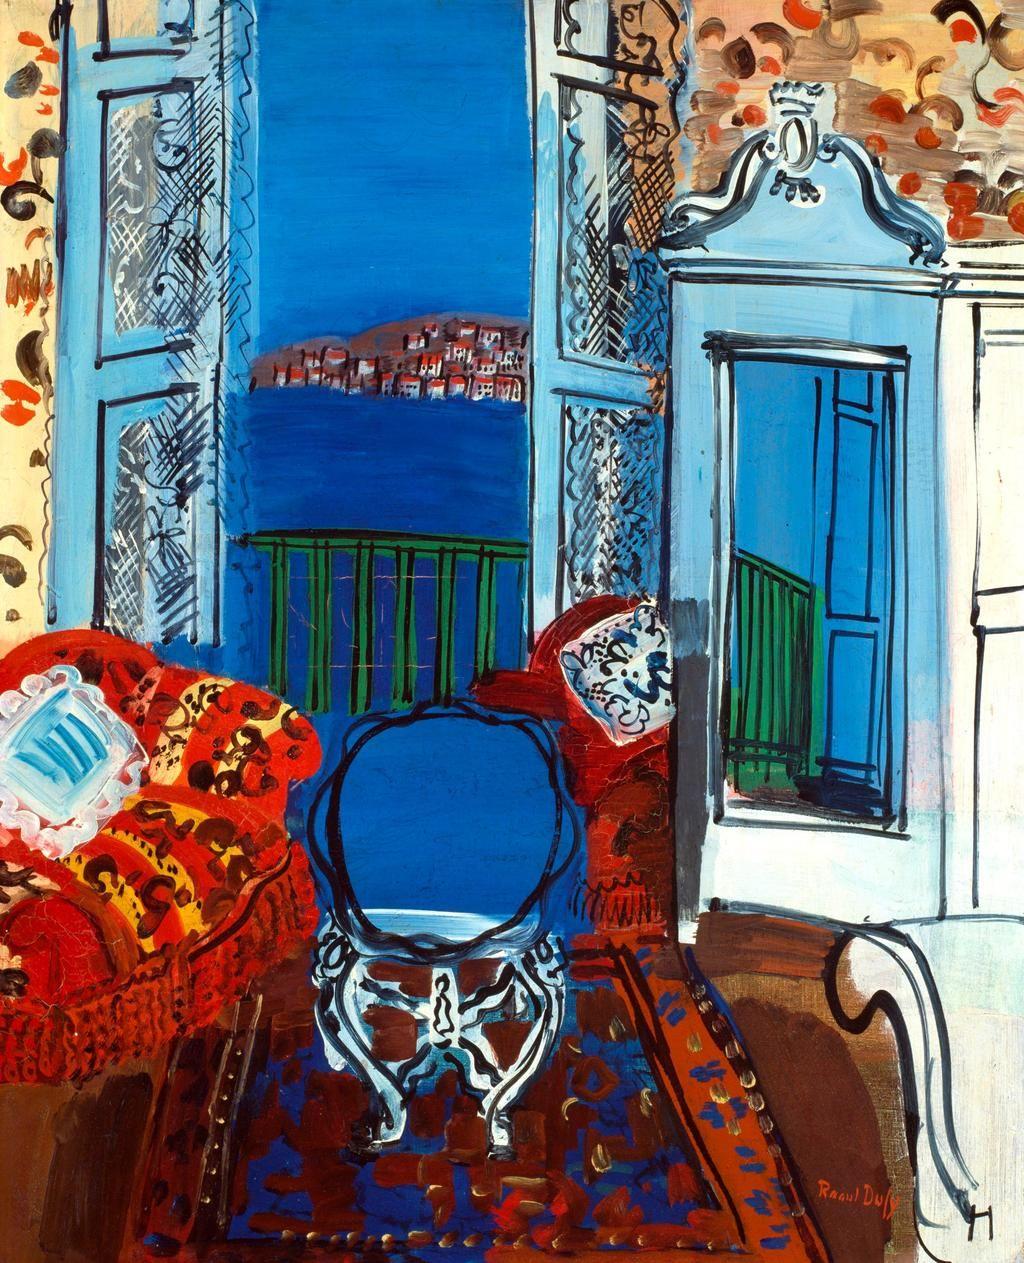 Juan Ngel Lpez In 2019 Desastre De Caj Raoul Dufy Artista Grafico Museo Arte